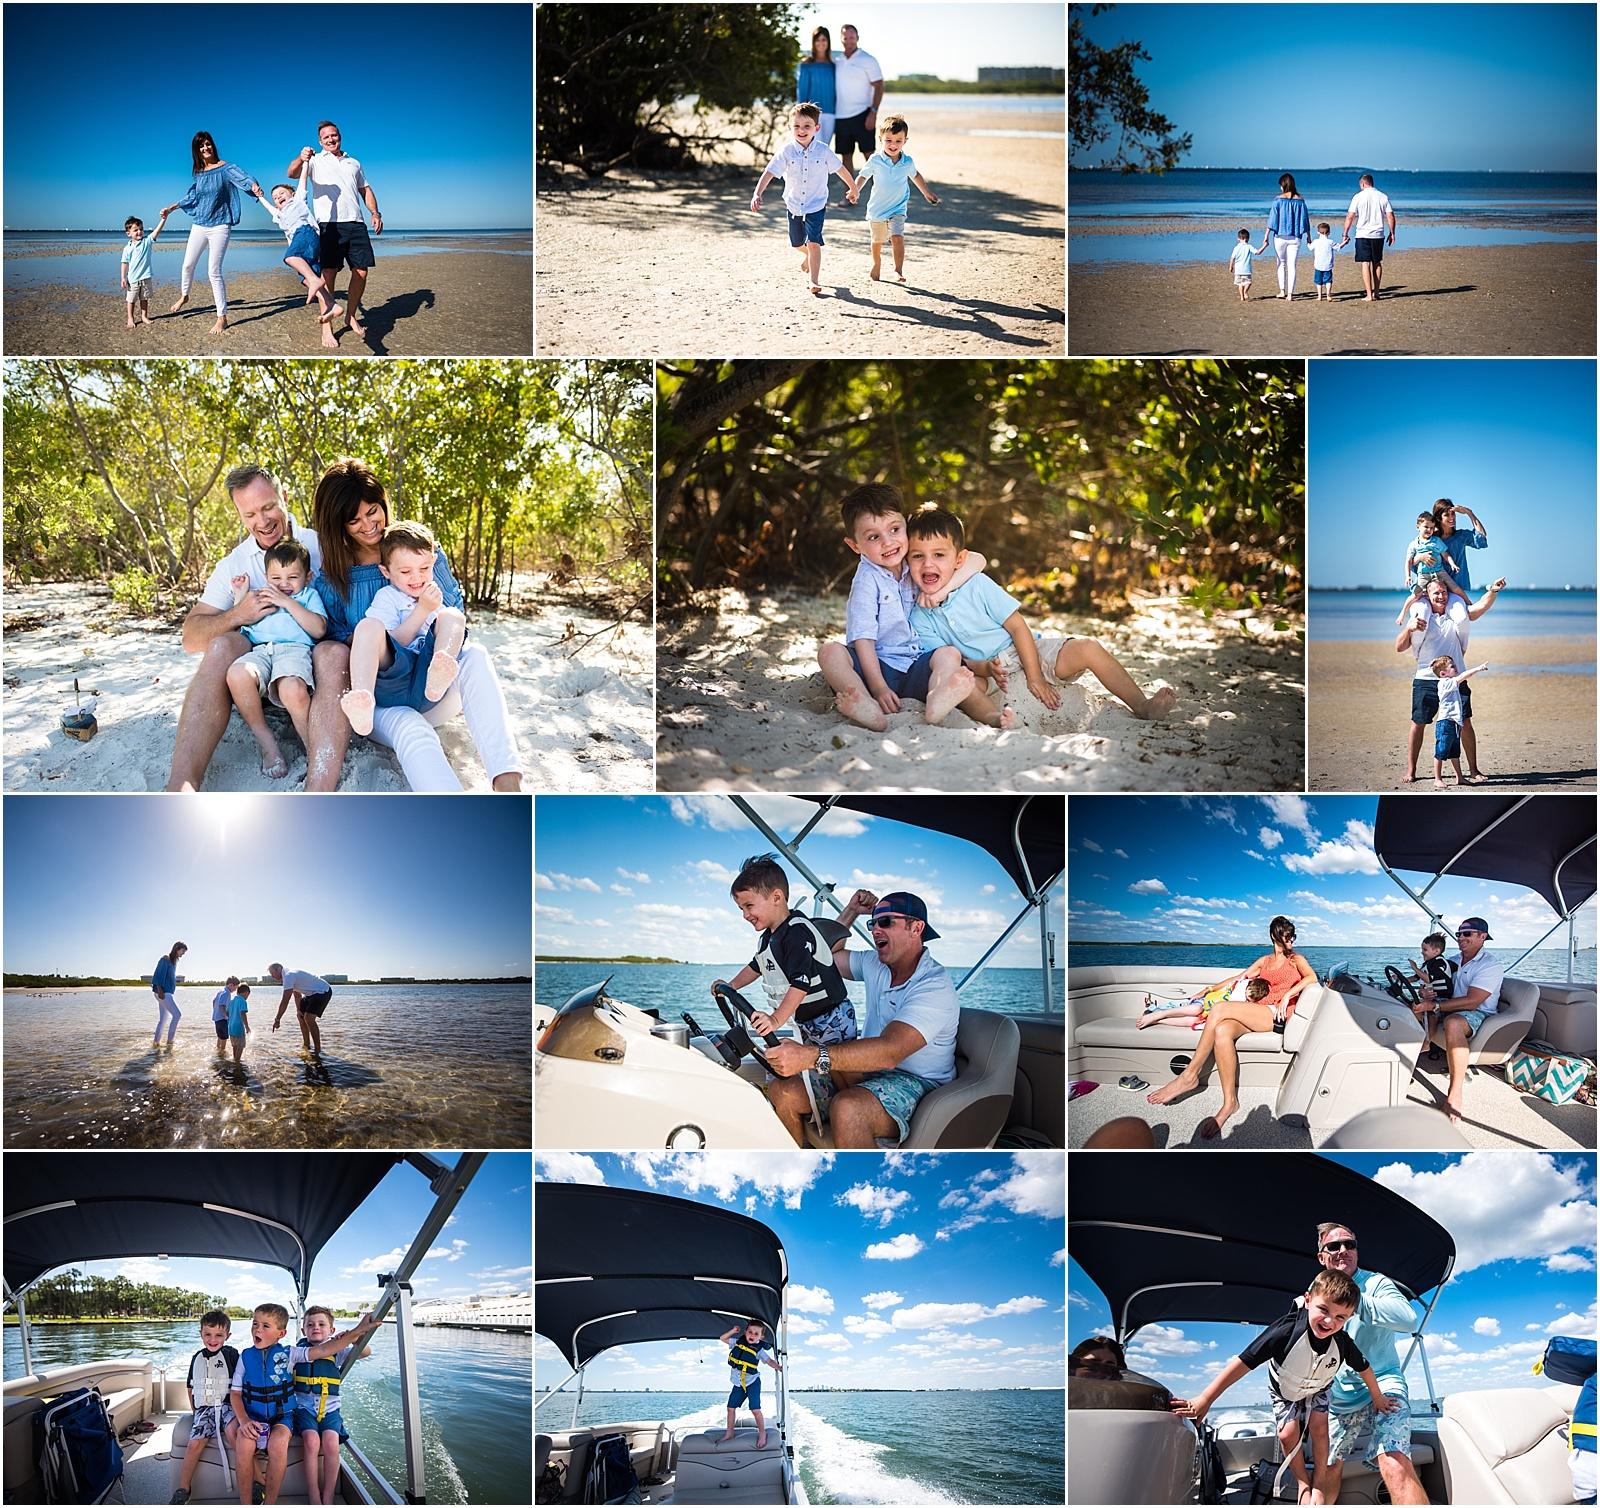 Florida_beach_Boat_Vacation_Maggie_Fuller.jpg